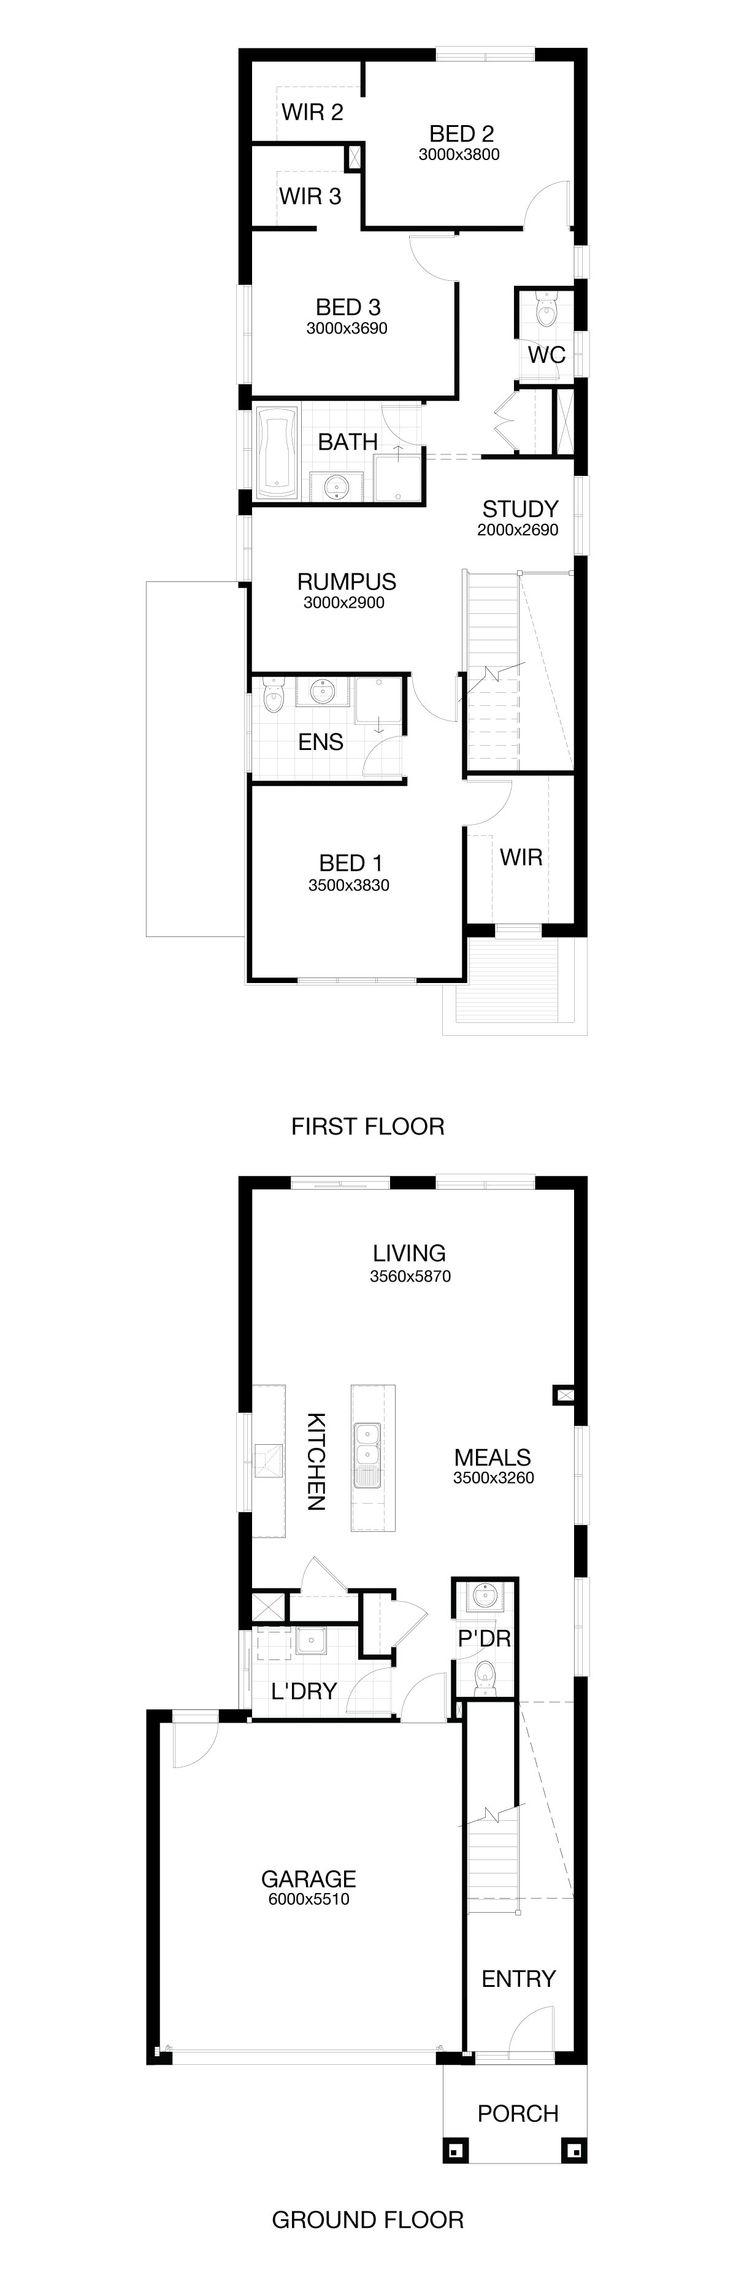 127 best House plans images on Pinterest | Home design, Floor ...